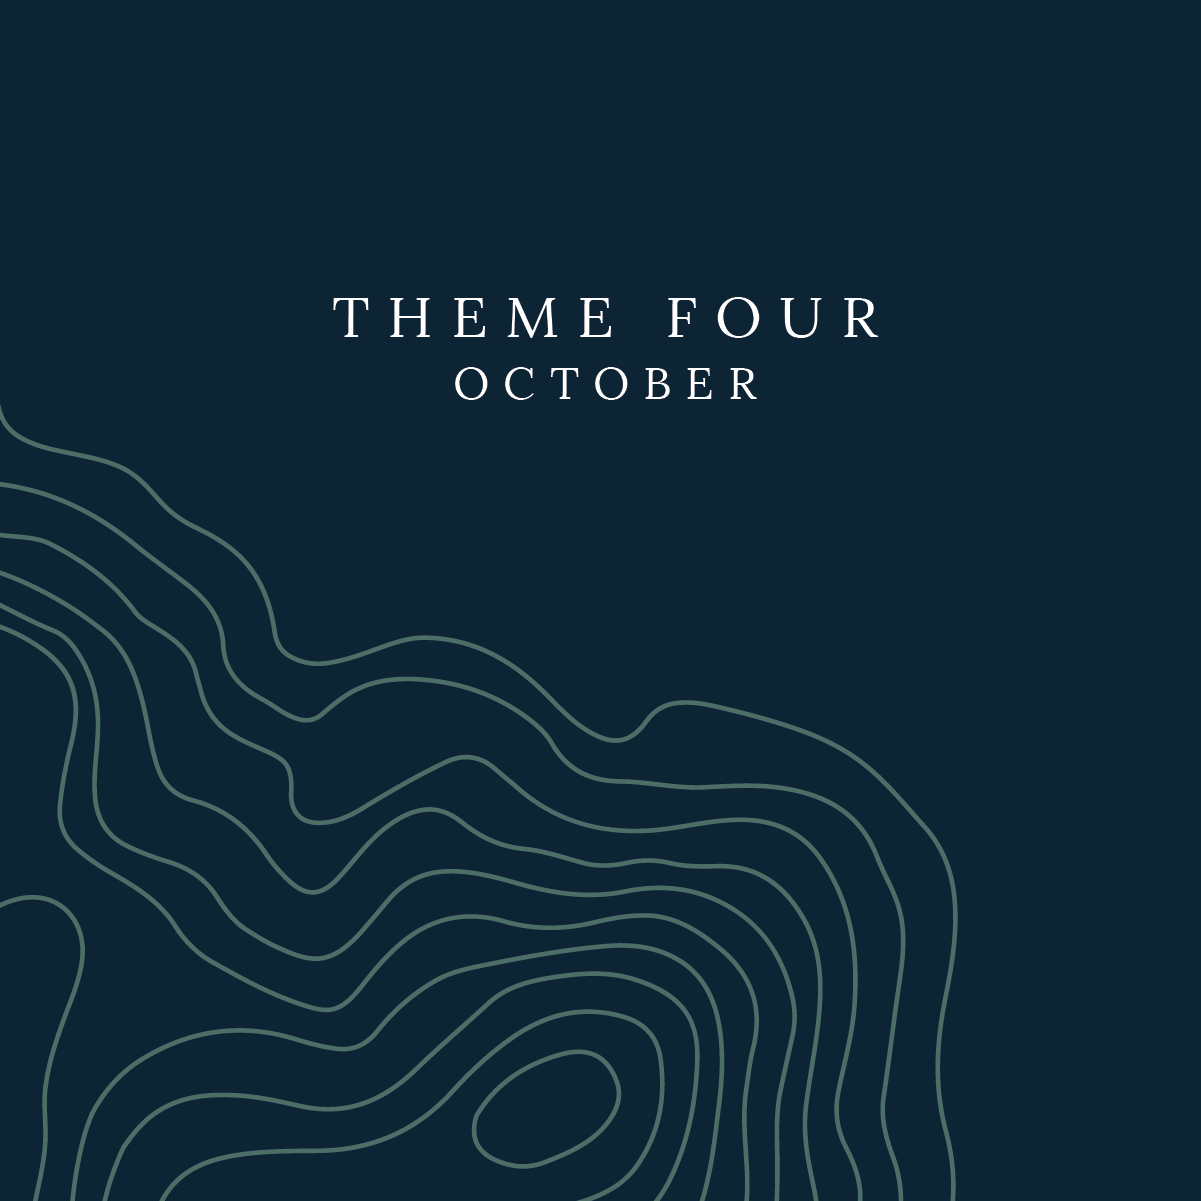 October Theme Thumbnails-11.png